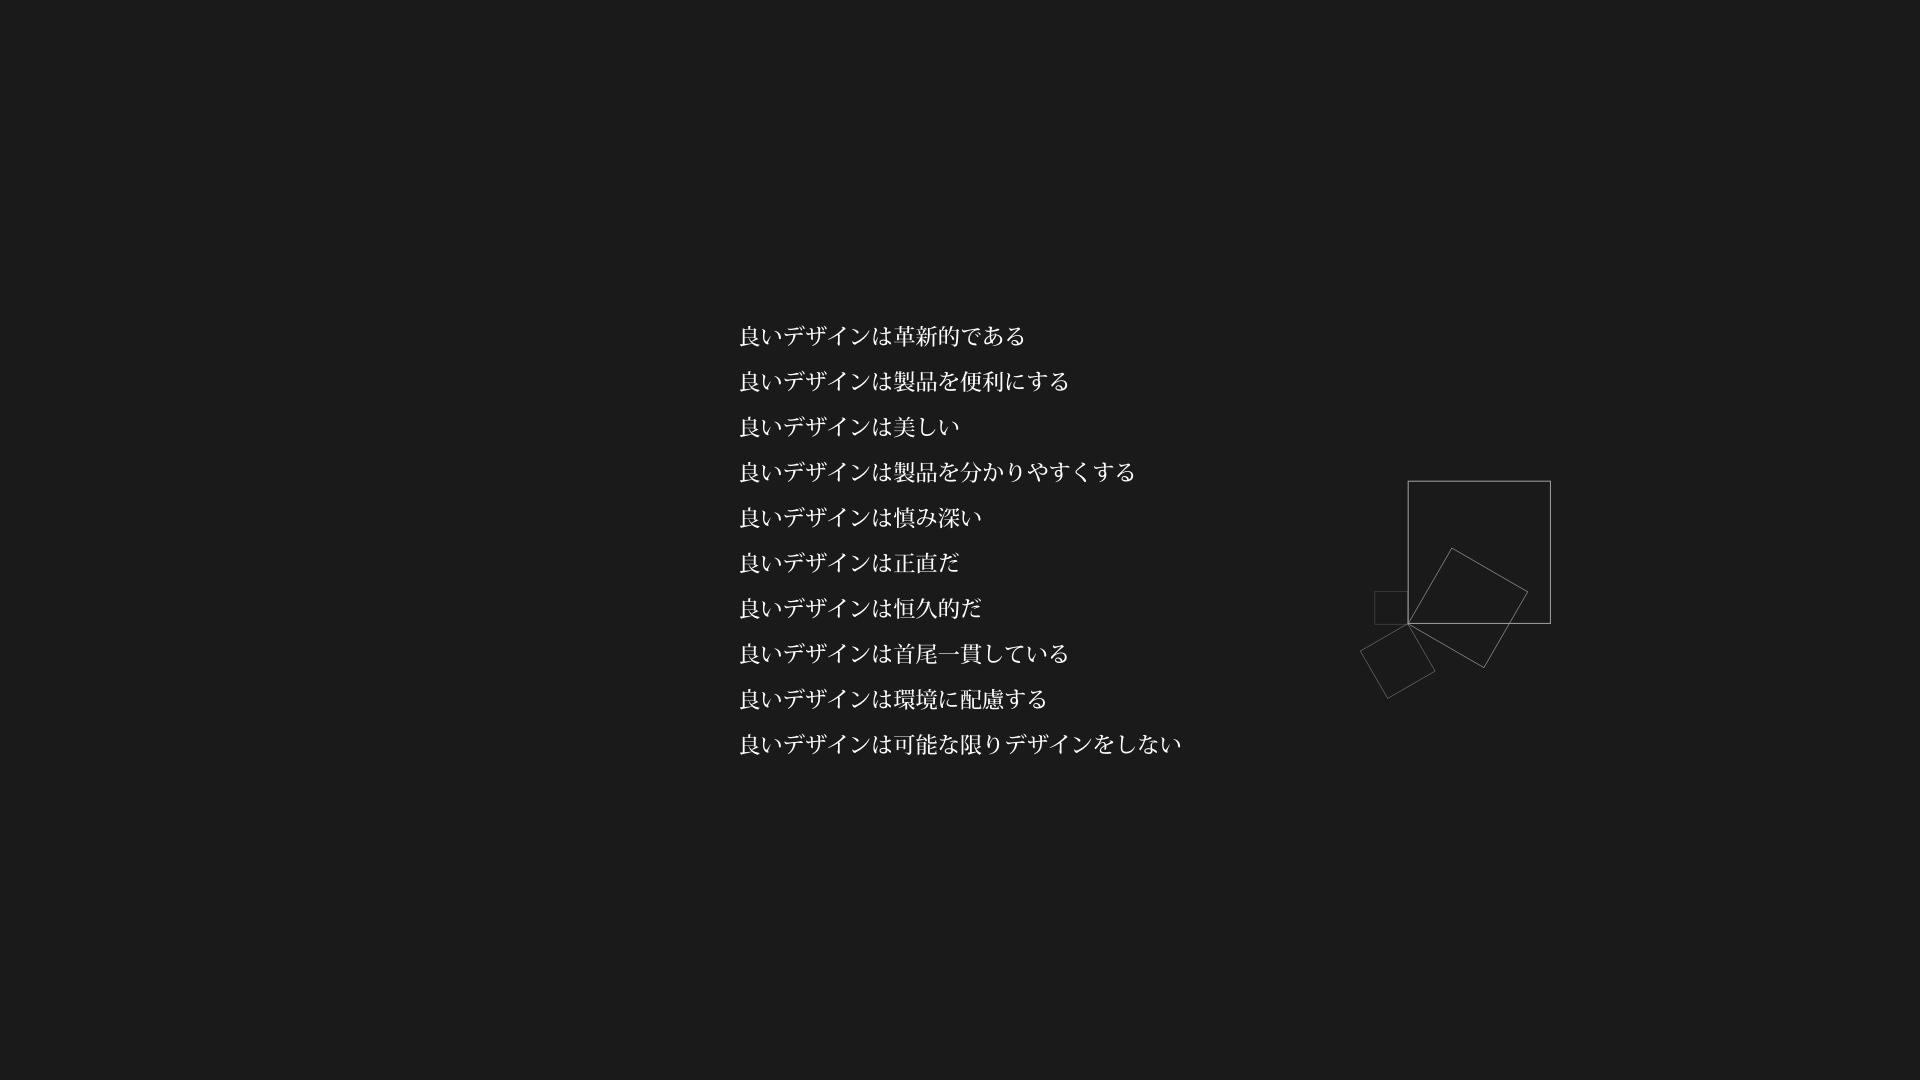 002_20150131_wallpaper